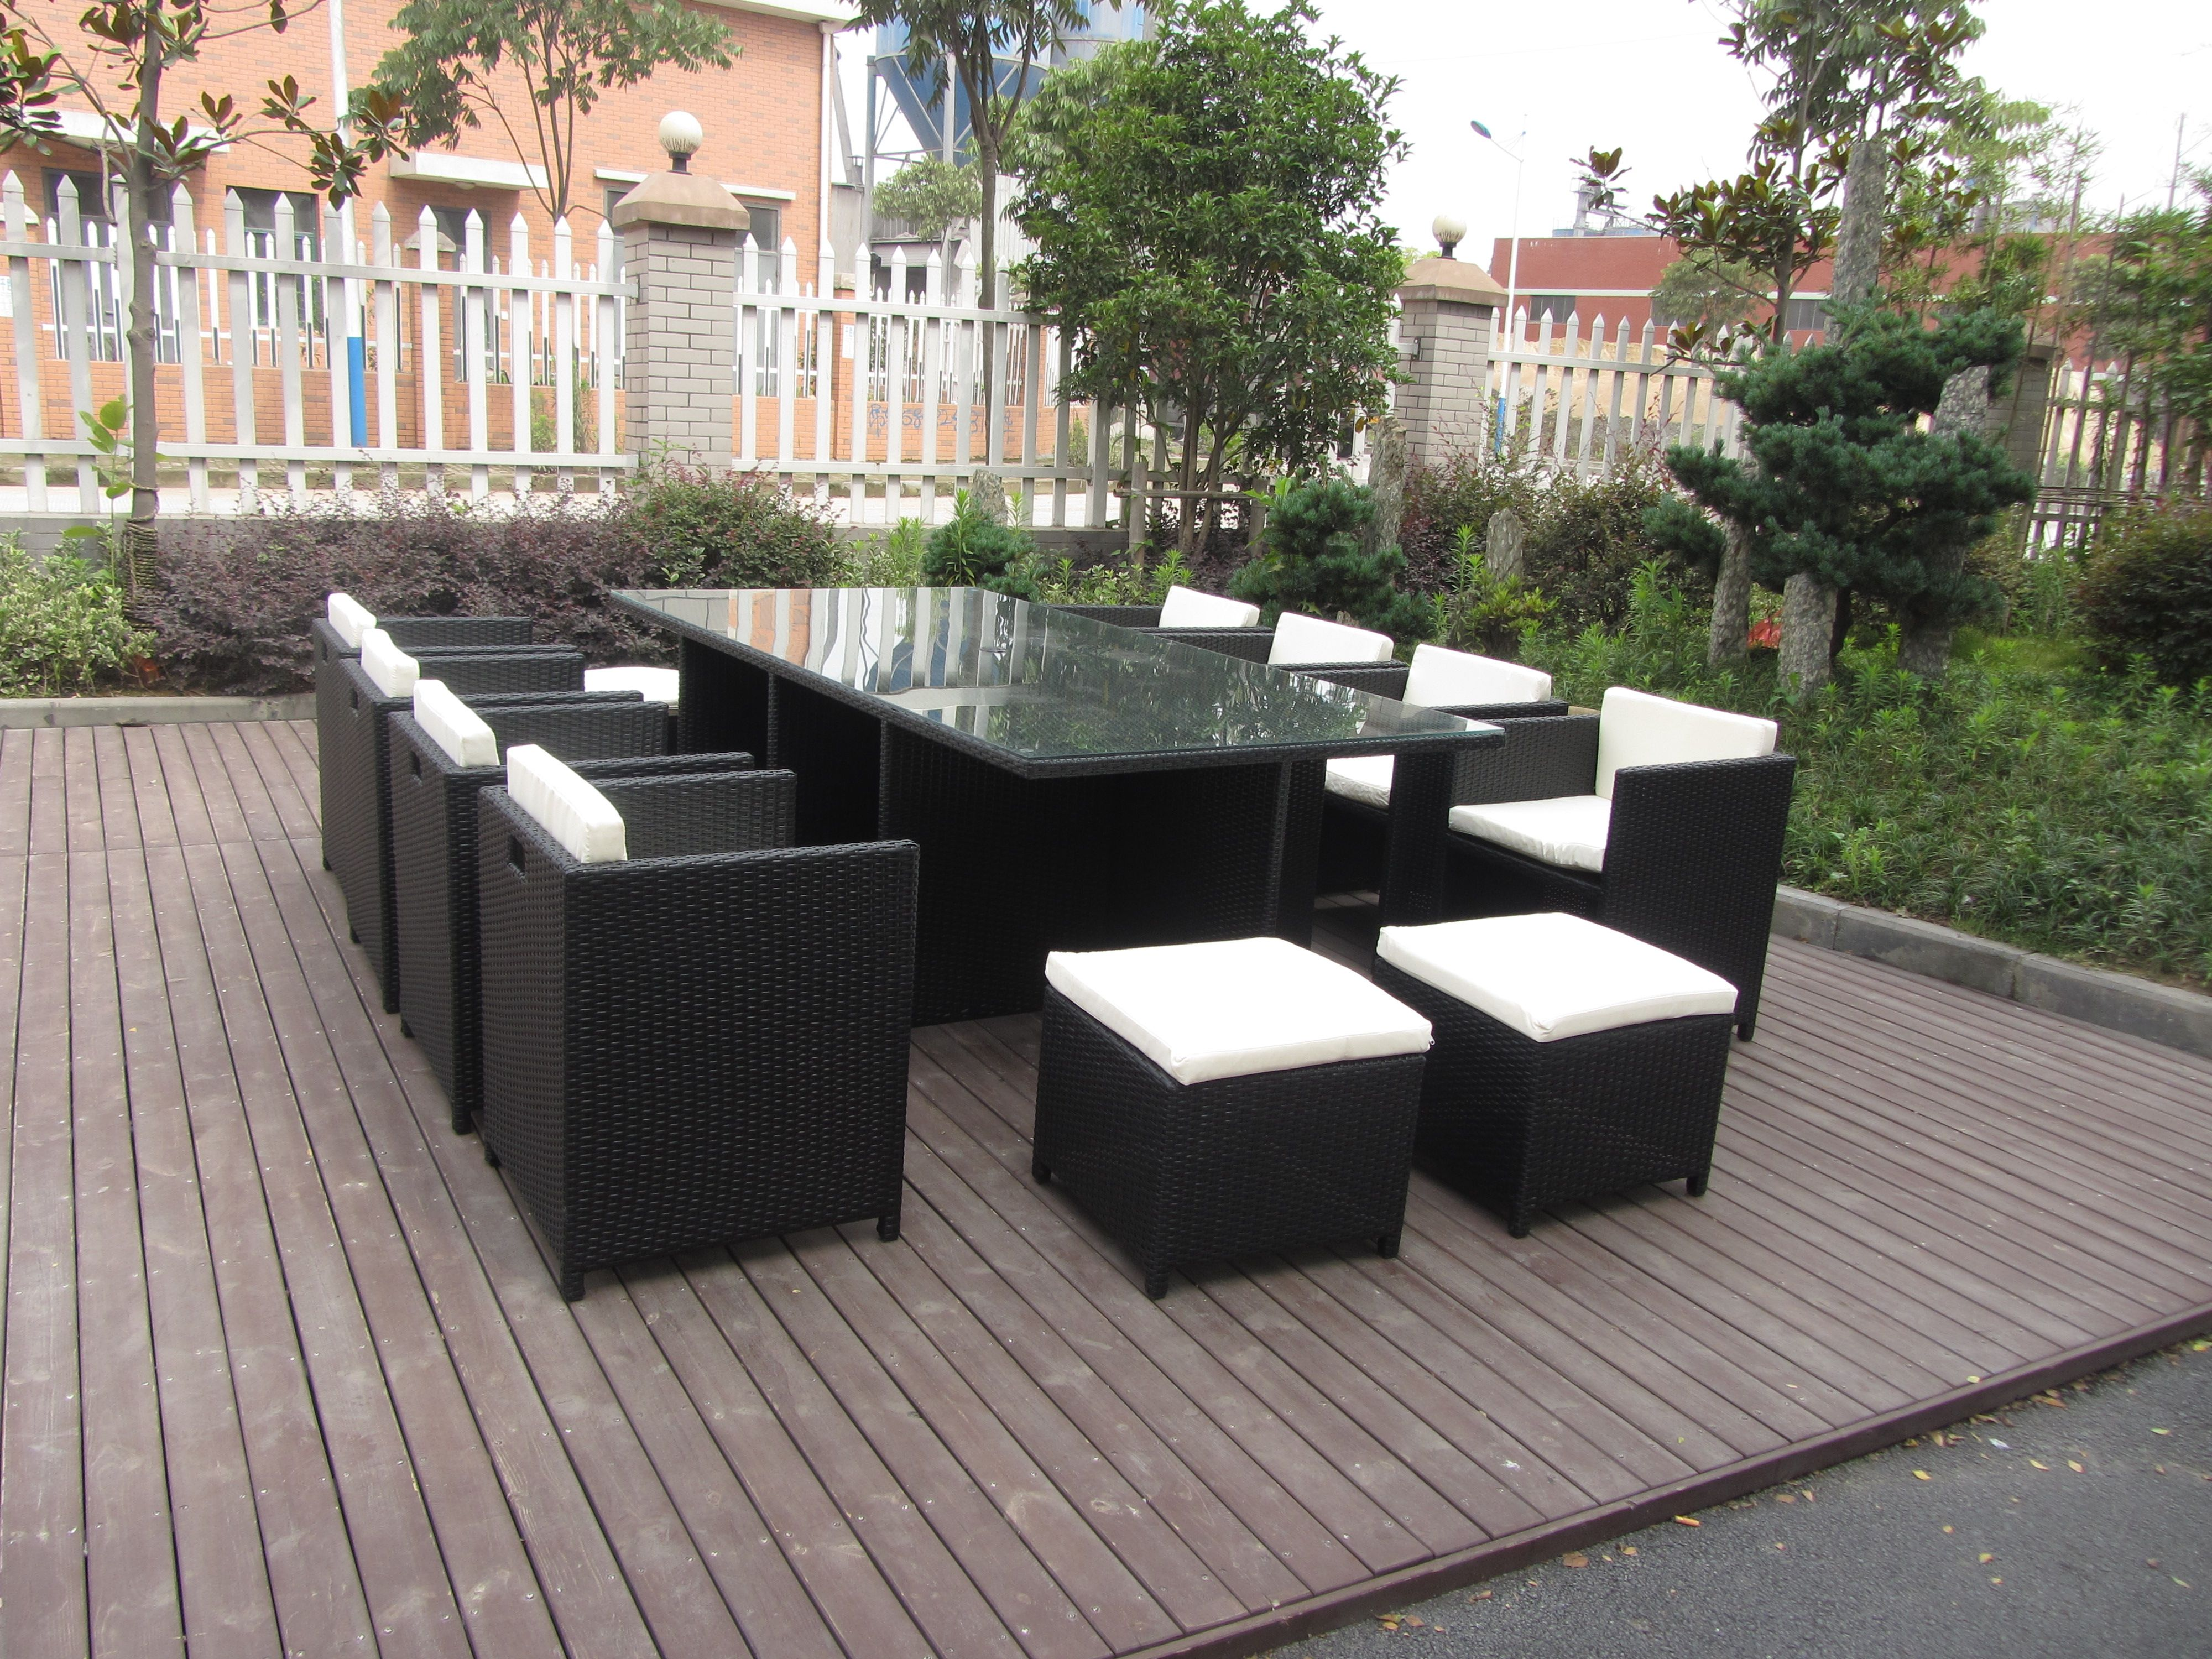 TG 8221 trygo outdoor furniture 2018 cube sofa sets